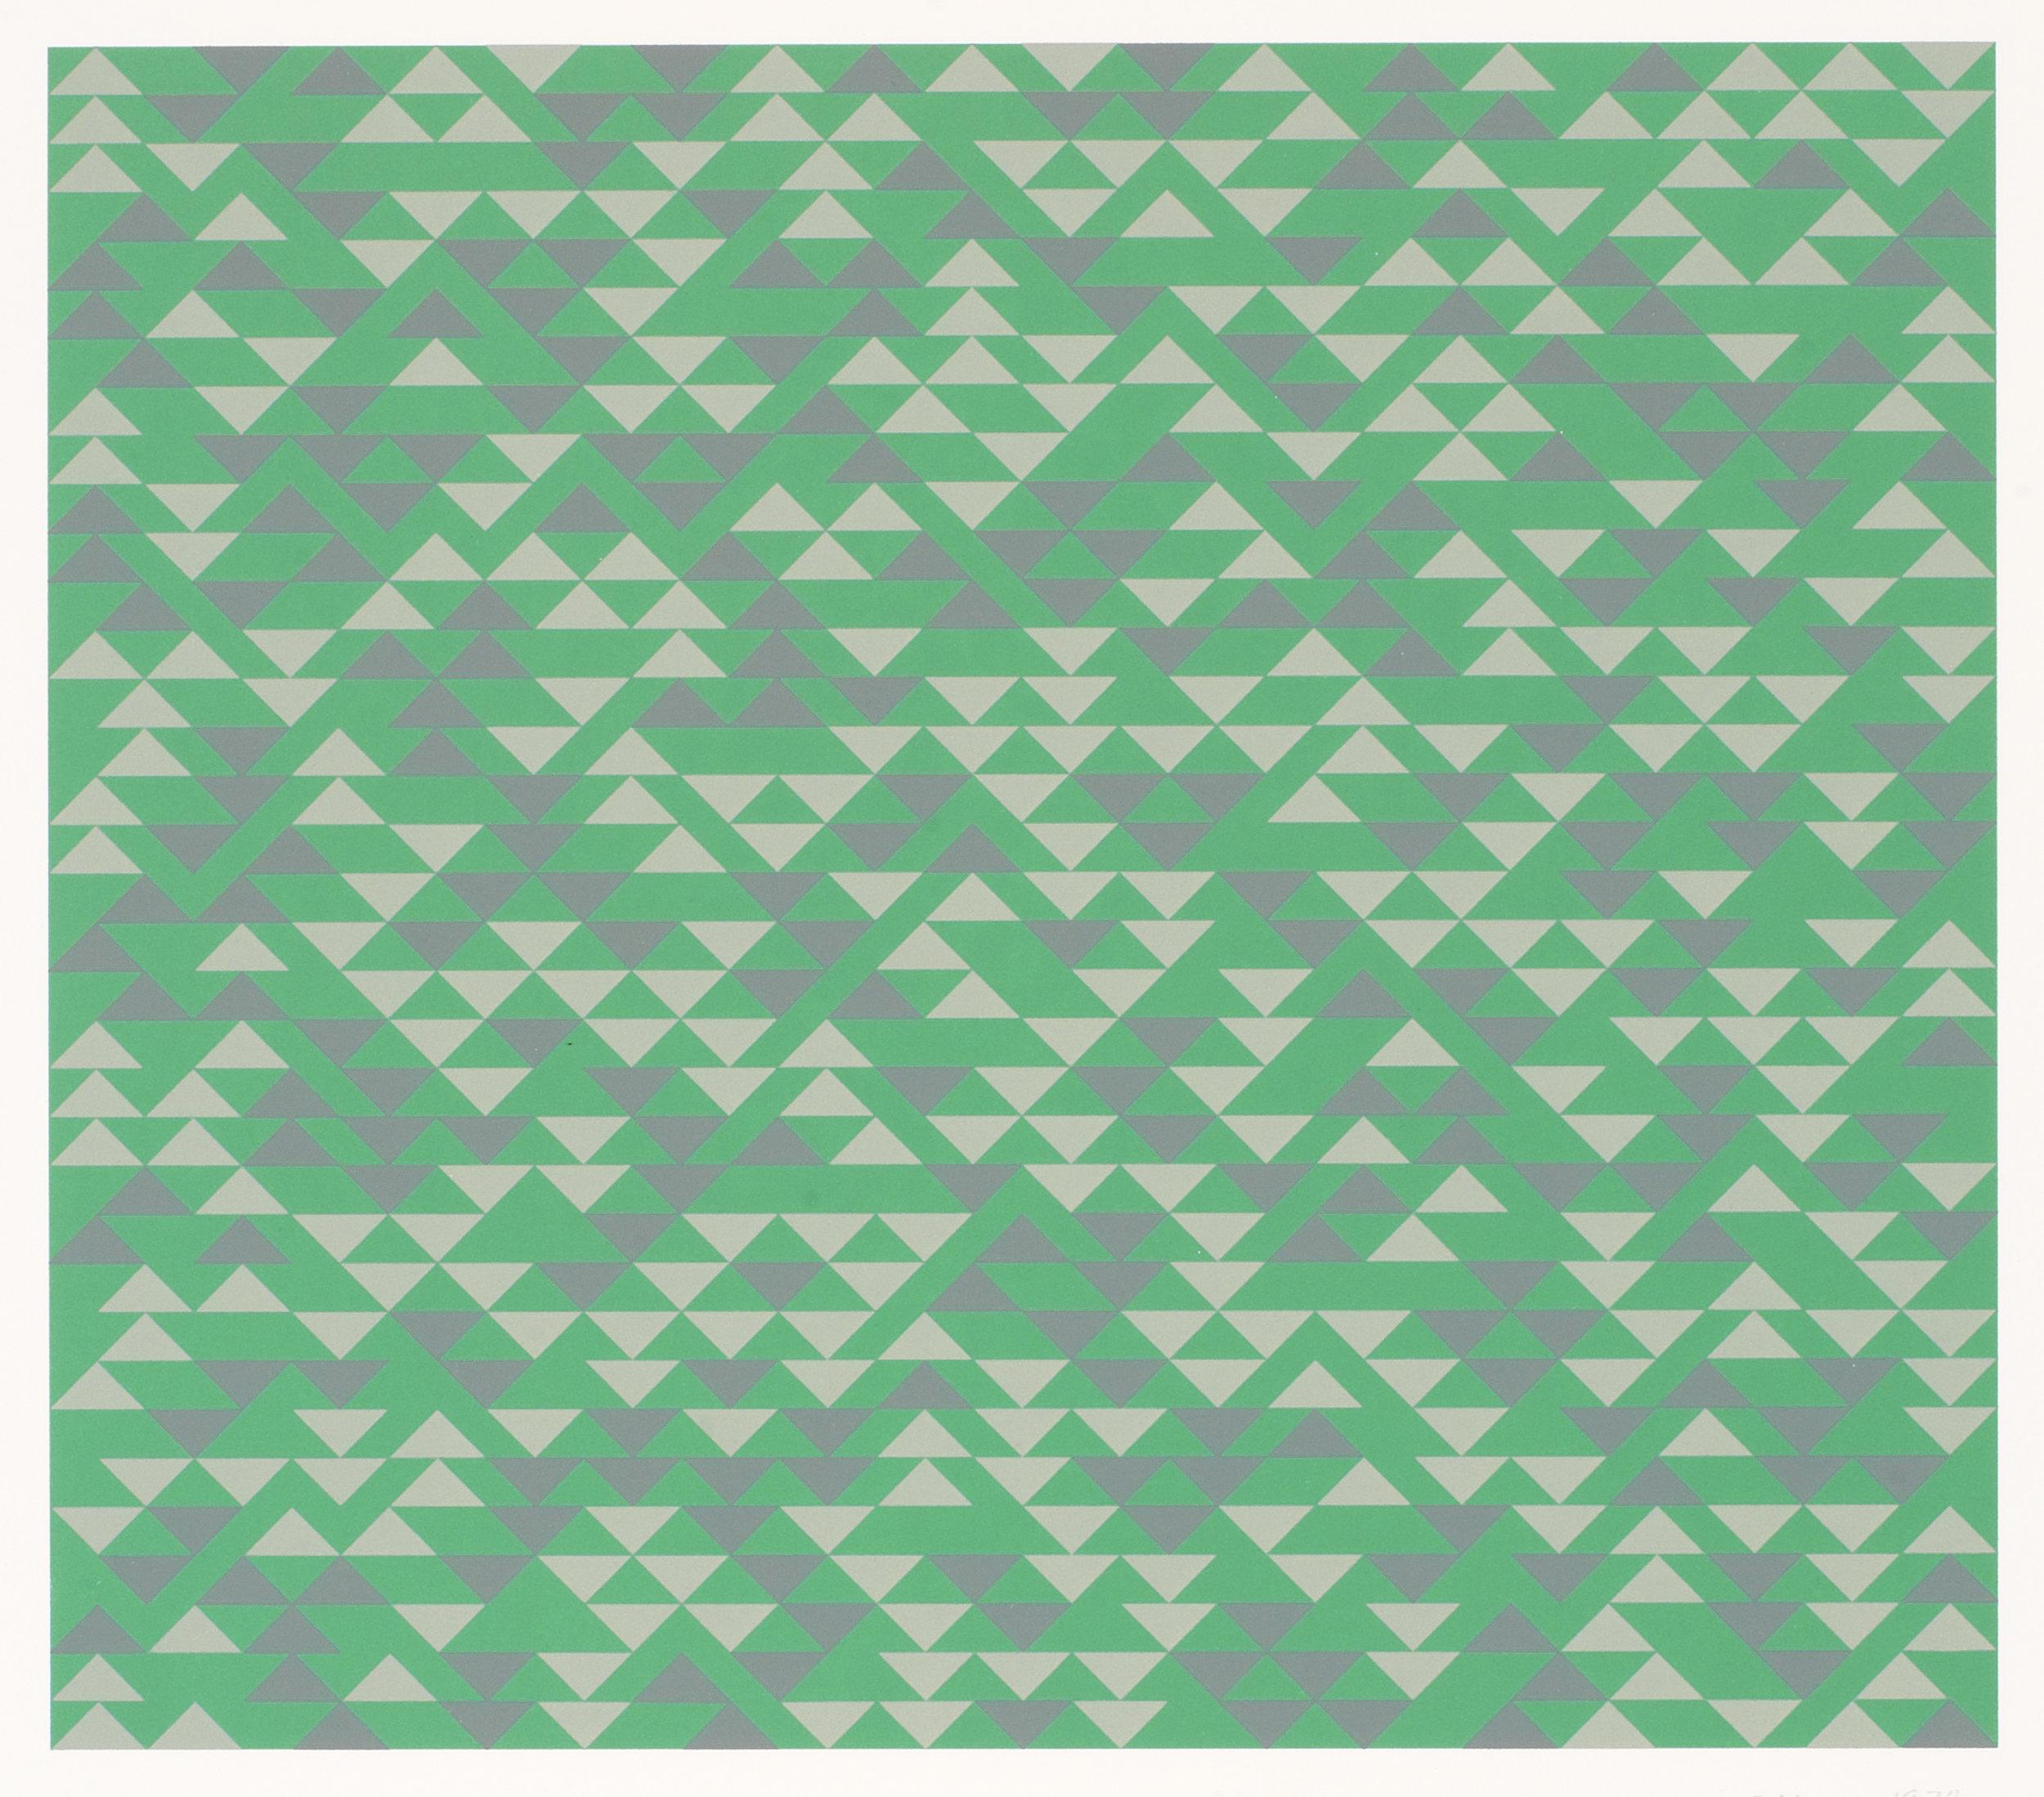 Anni Albers   TR II  1970, Lithograph, 50.5 x 55.6 cm, The Josef and Anni Albers Foundation, Bethany CT © 2018 The Josef and Anni Albers Foundation/Artists Rights Society (ARS), New York/DACS, London, Photo: Tim Nighswander/Imaging4Art